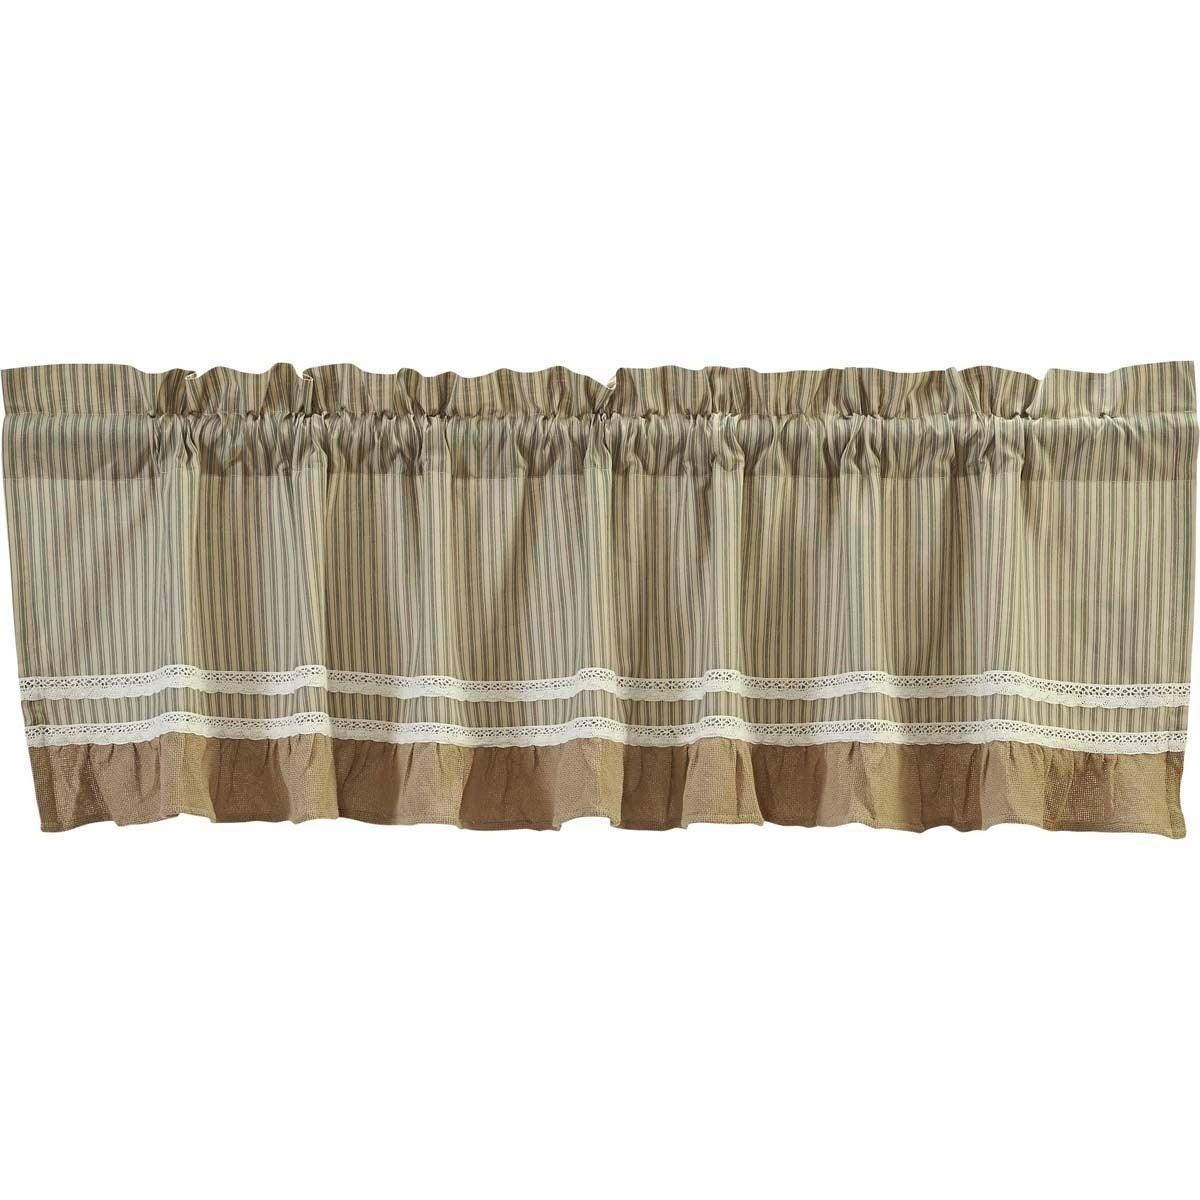 Details about Farmhouse Kitchen Curtains VHC Kendra Stripe Valance Rod